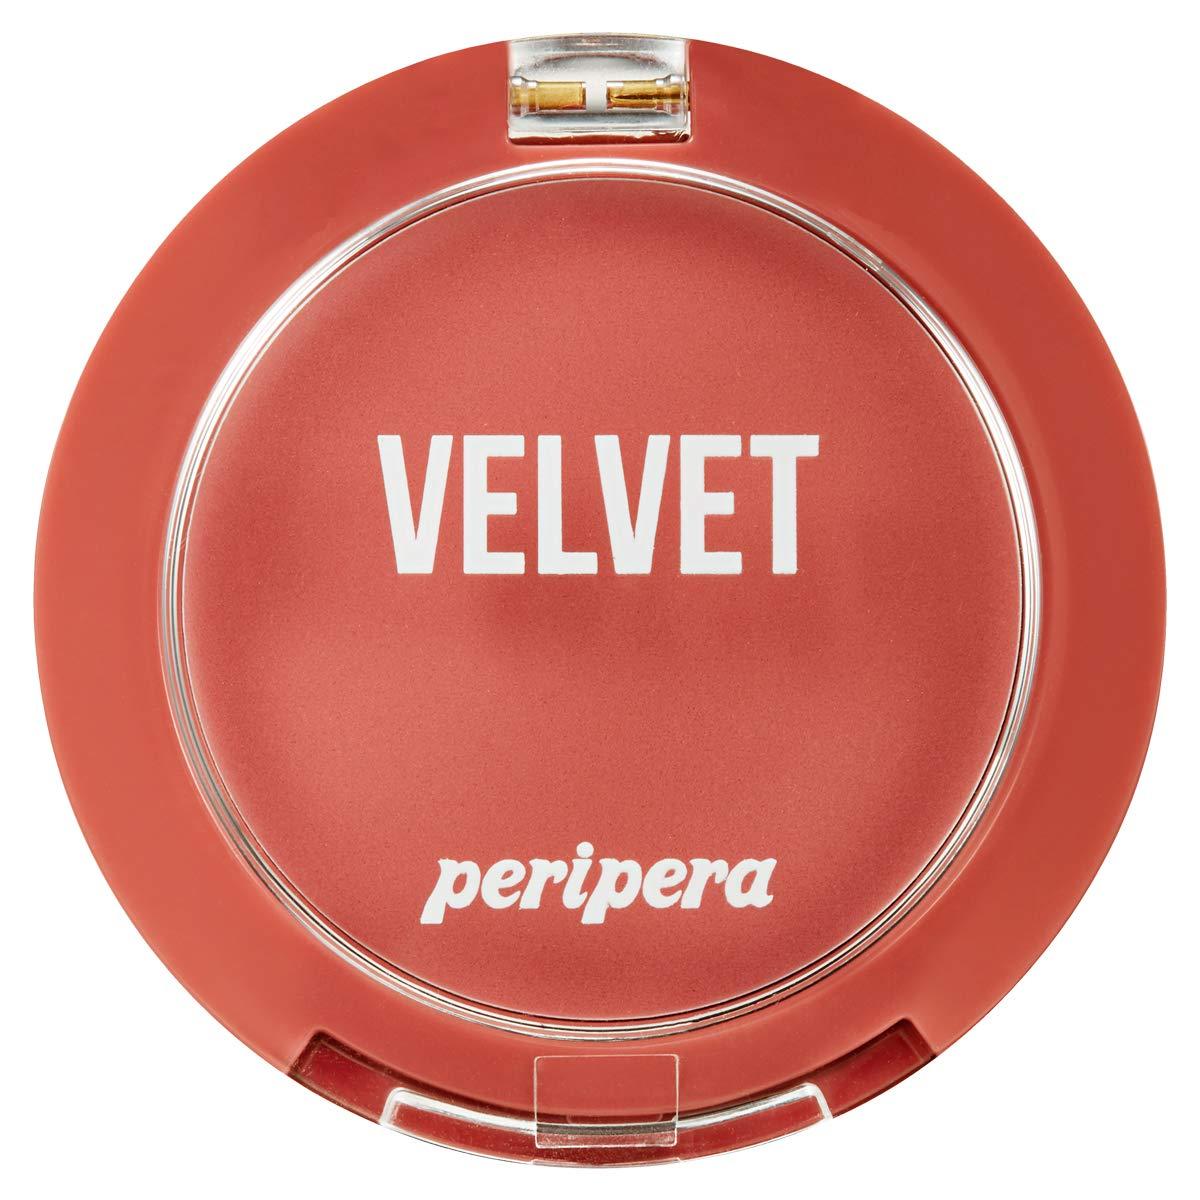 Peripera Velvet Cheek 0.1 Ounce 007 Cozy Creamy Rose CLIO